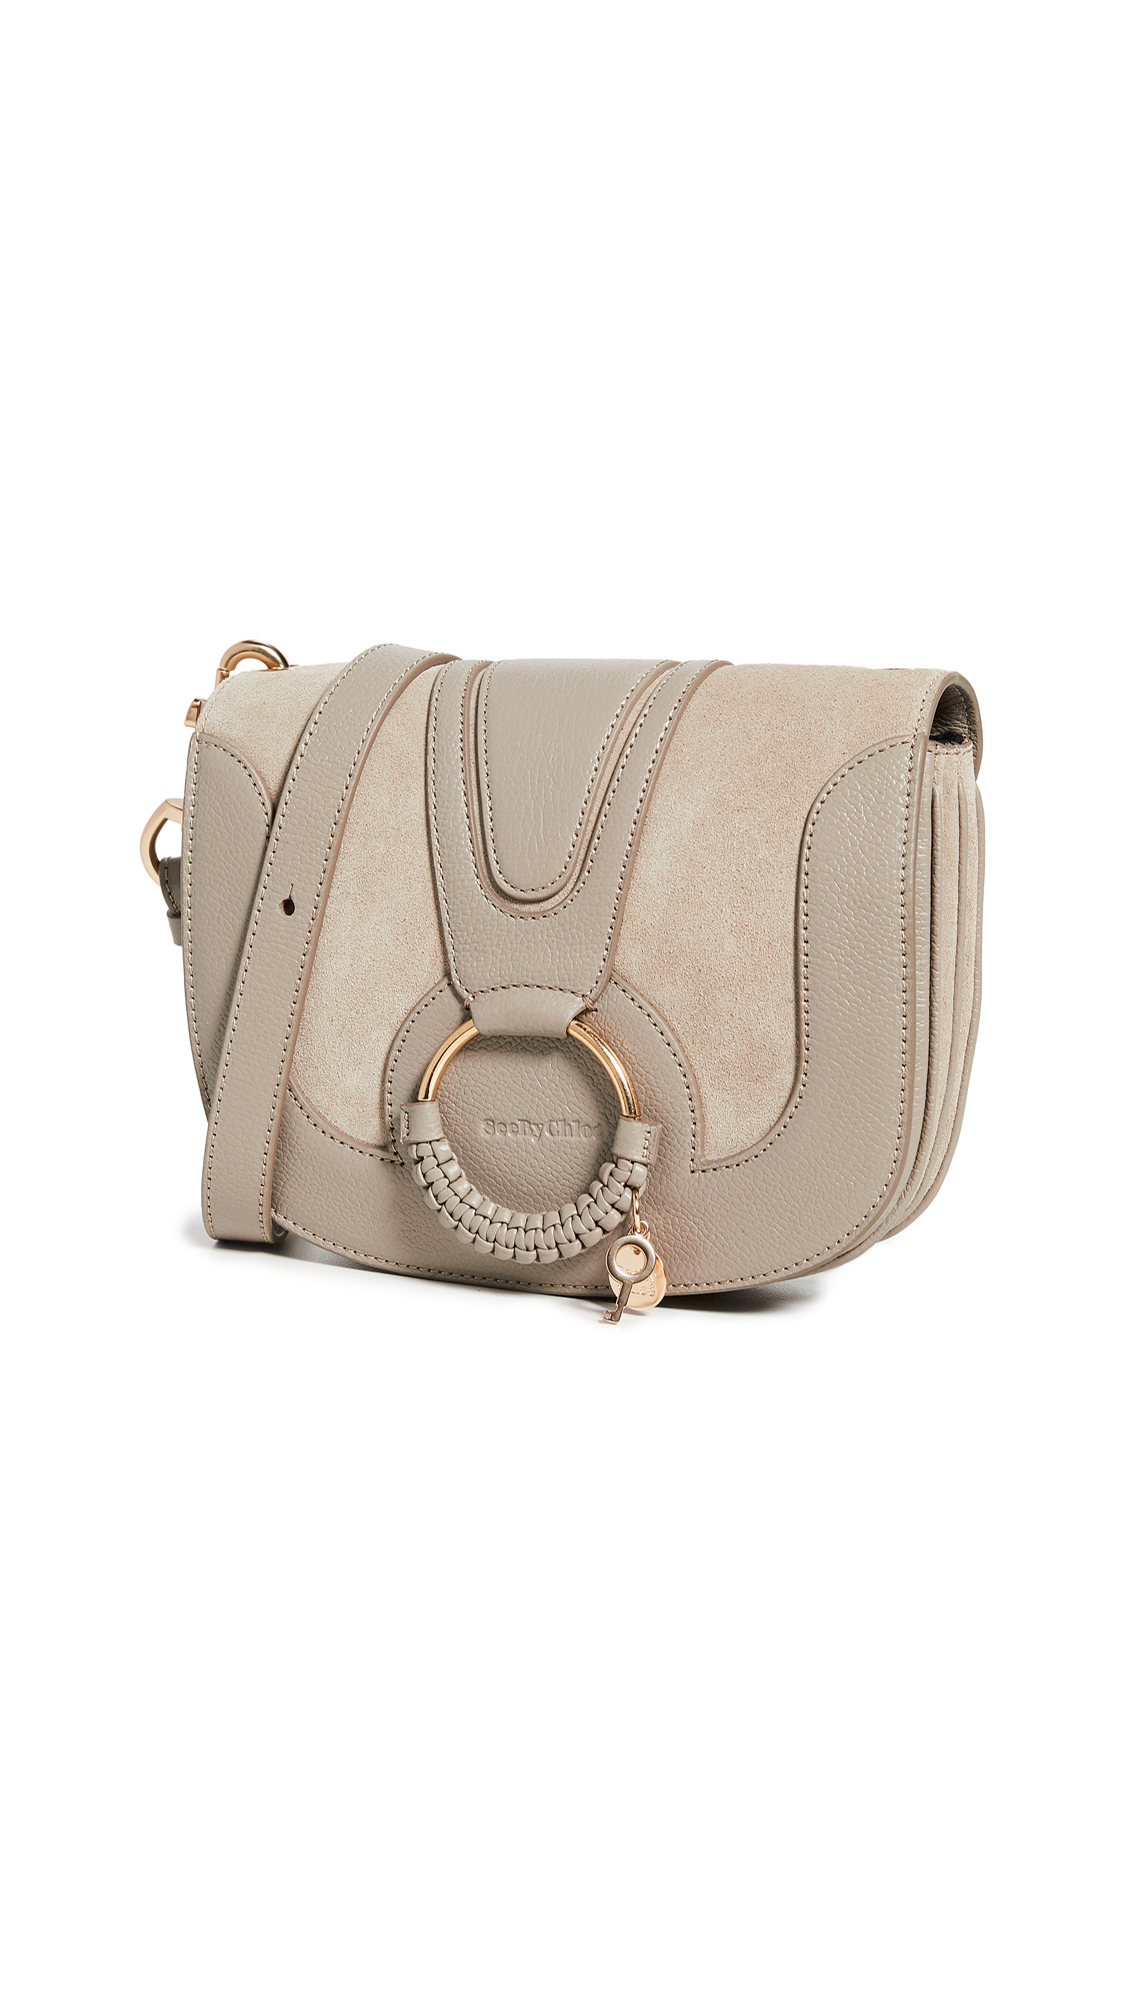 Buy See by Chloe online - photo of See by Chloe Hana Saddle Bag